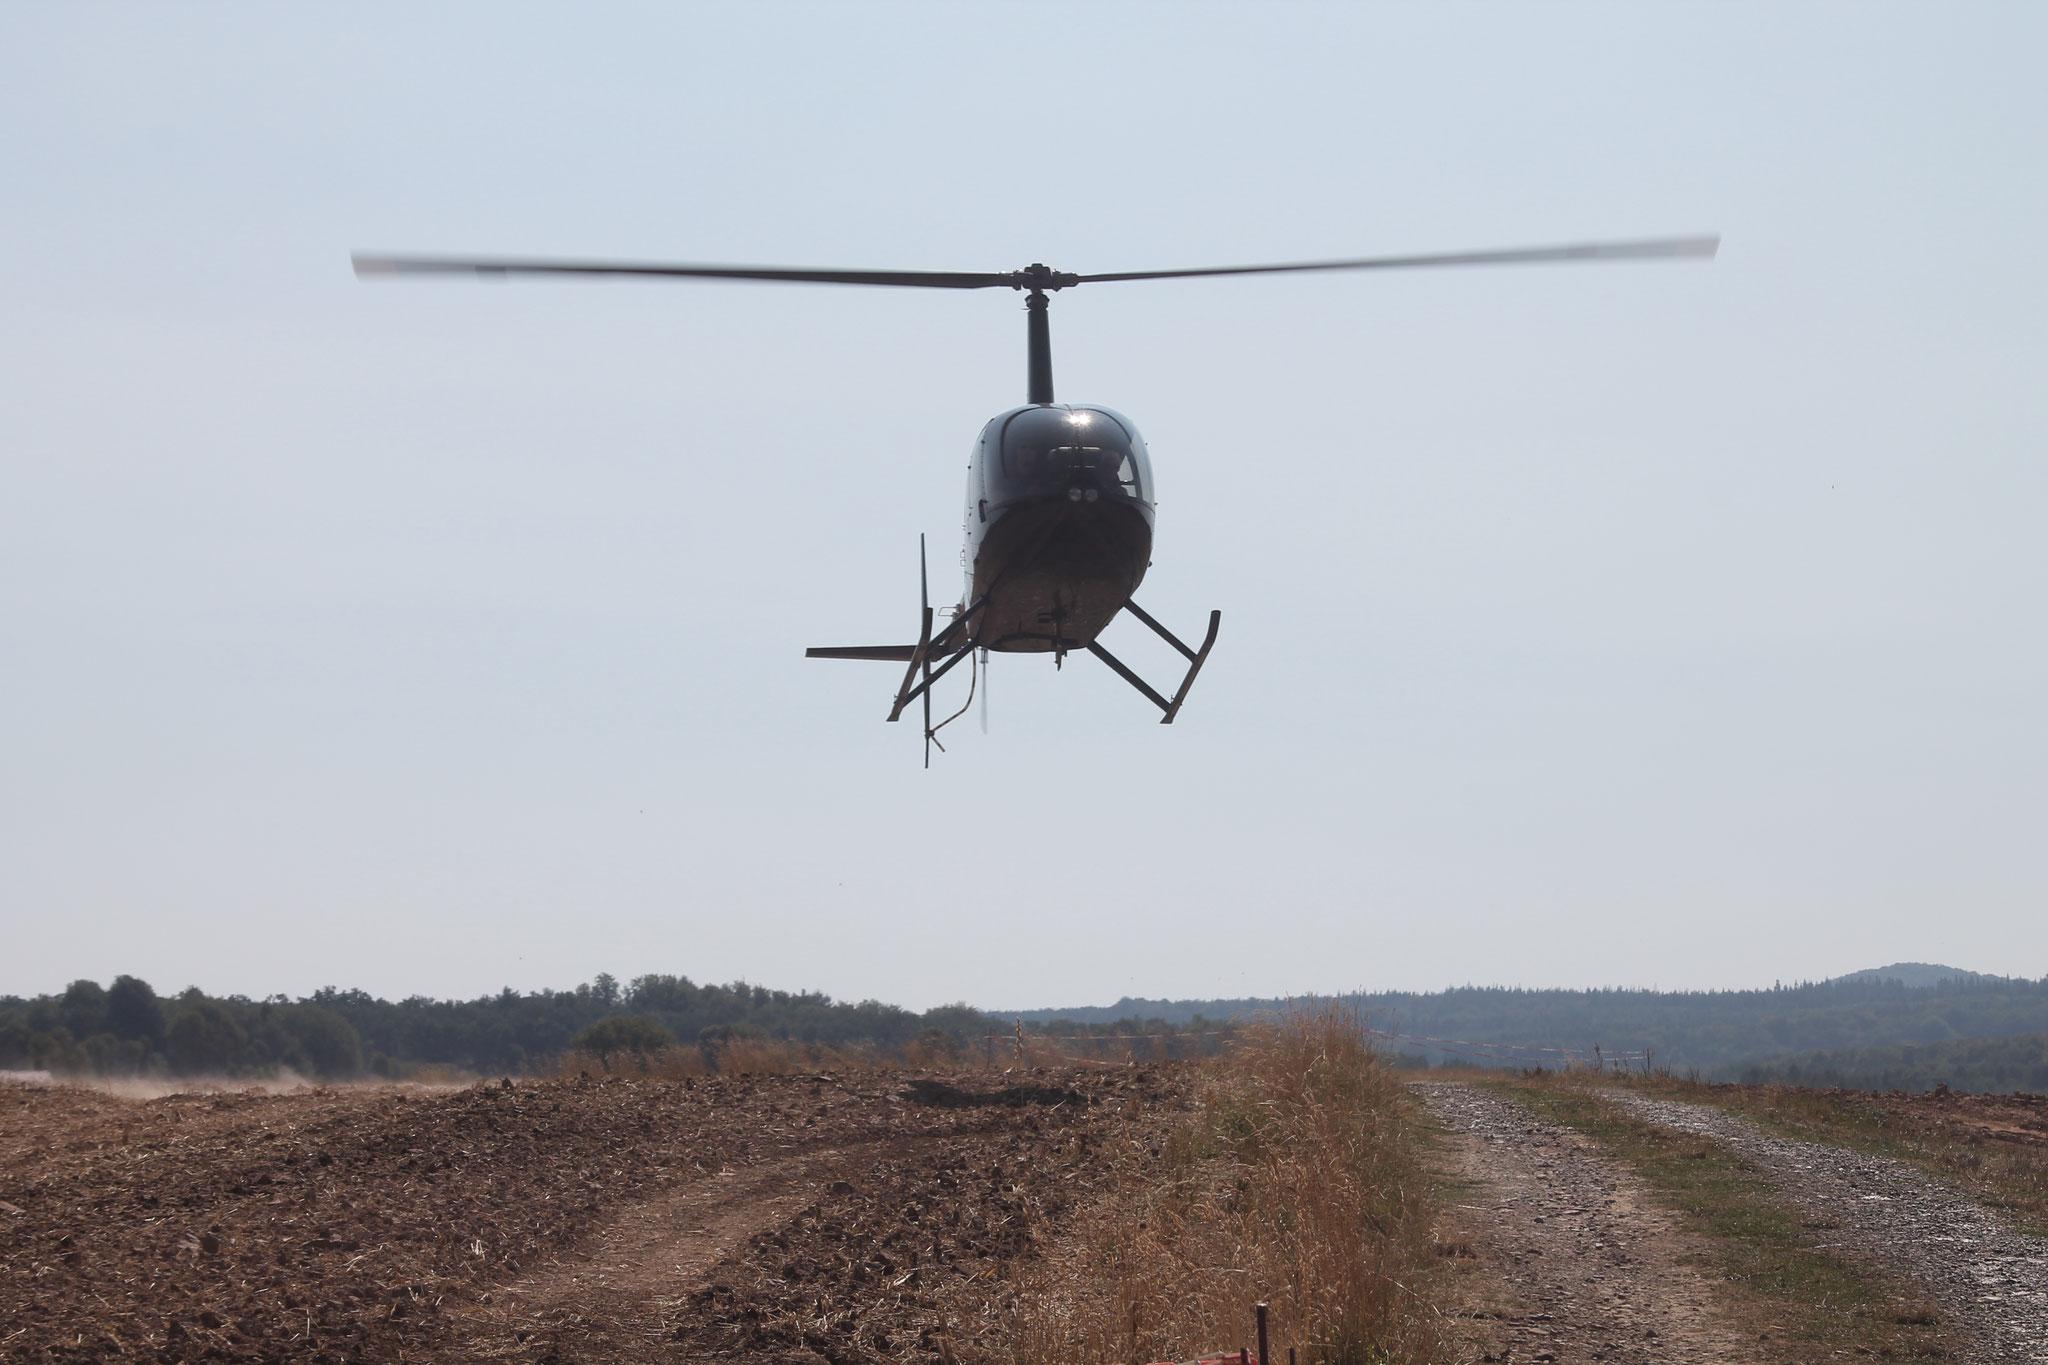 Helikopter im Anflug